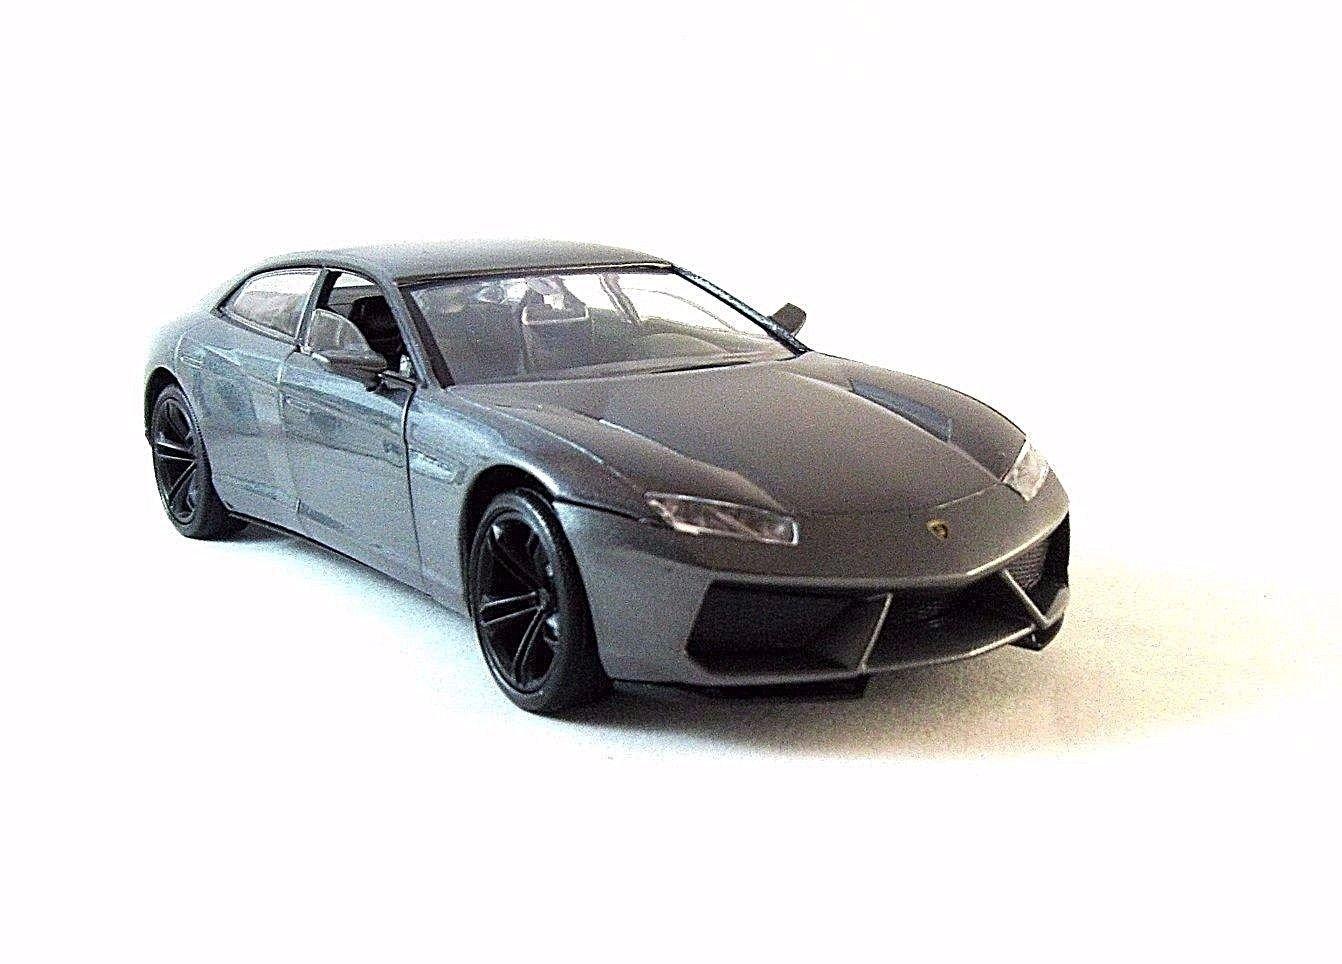 LAMBORGHINI ESTOQUE 2008 SILVER MONDOMOTORS 1/24 DIECAST CAR COLLECTOR'S MODEL